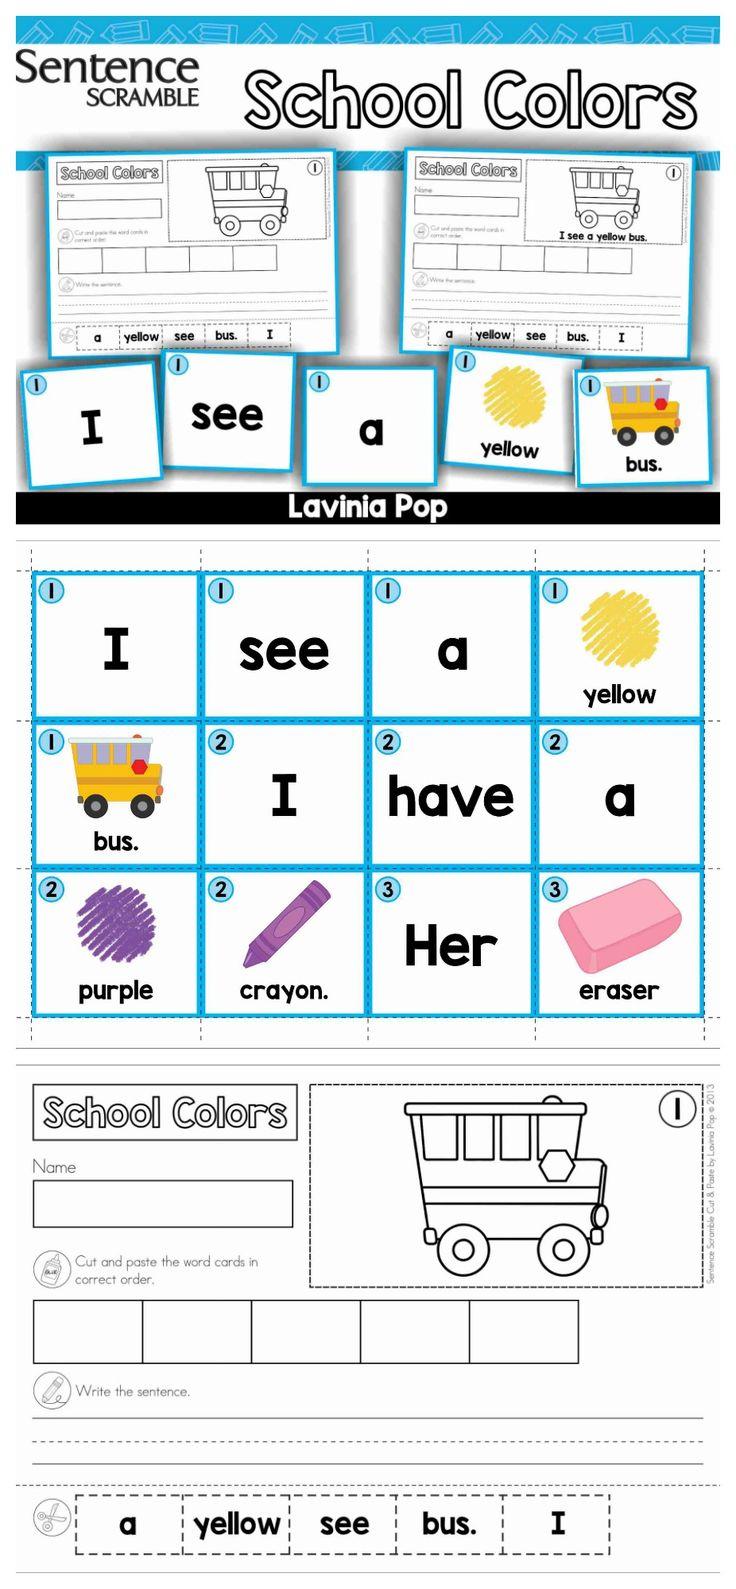 worksheet Sentence Scramble Worksheets 221 best sentence building images on pinterest scramble with cut and paste worksheets school colors